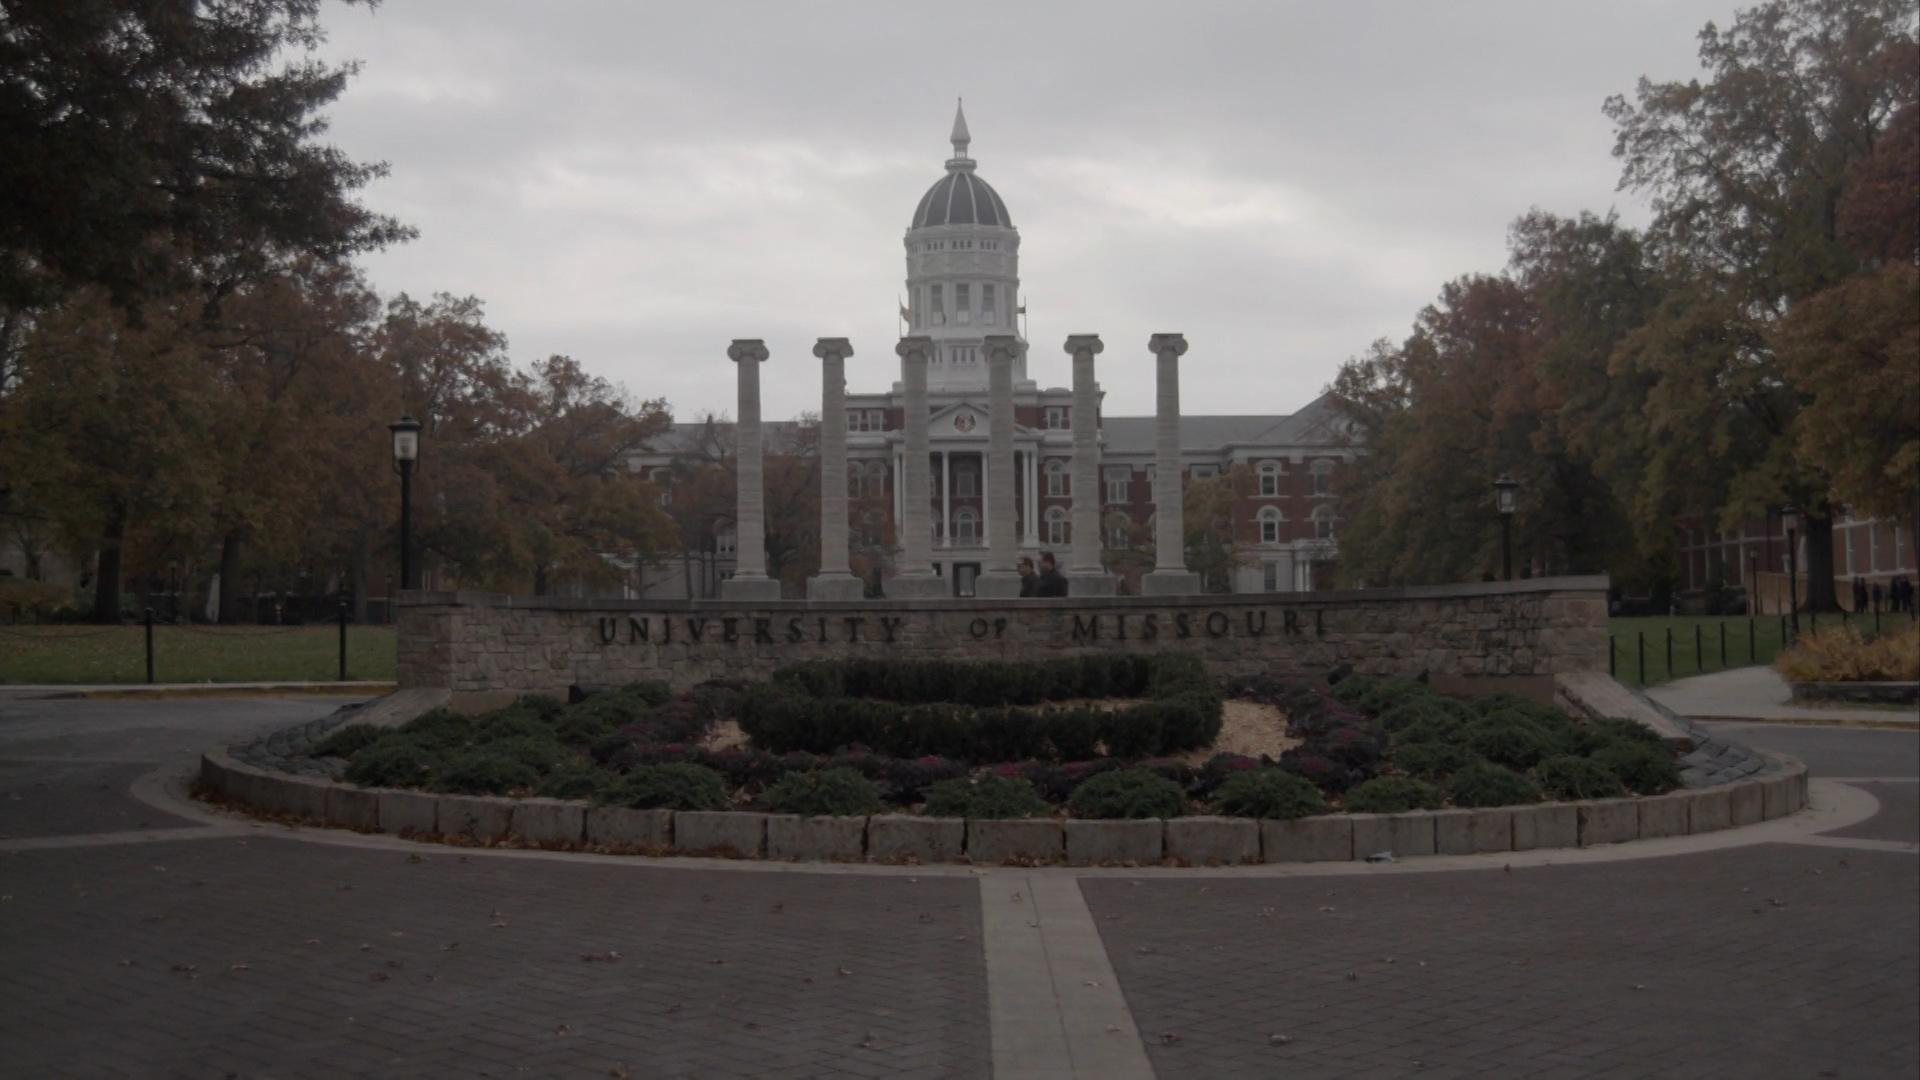 Missouri Campus Quiet After Online Threats Nbc News